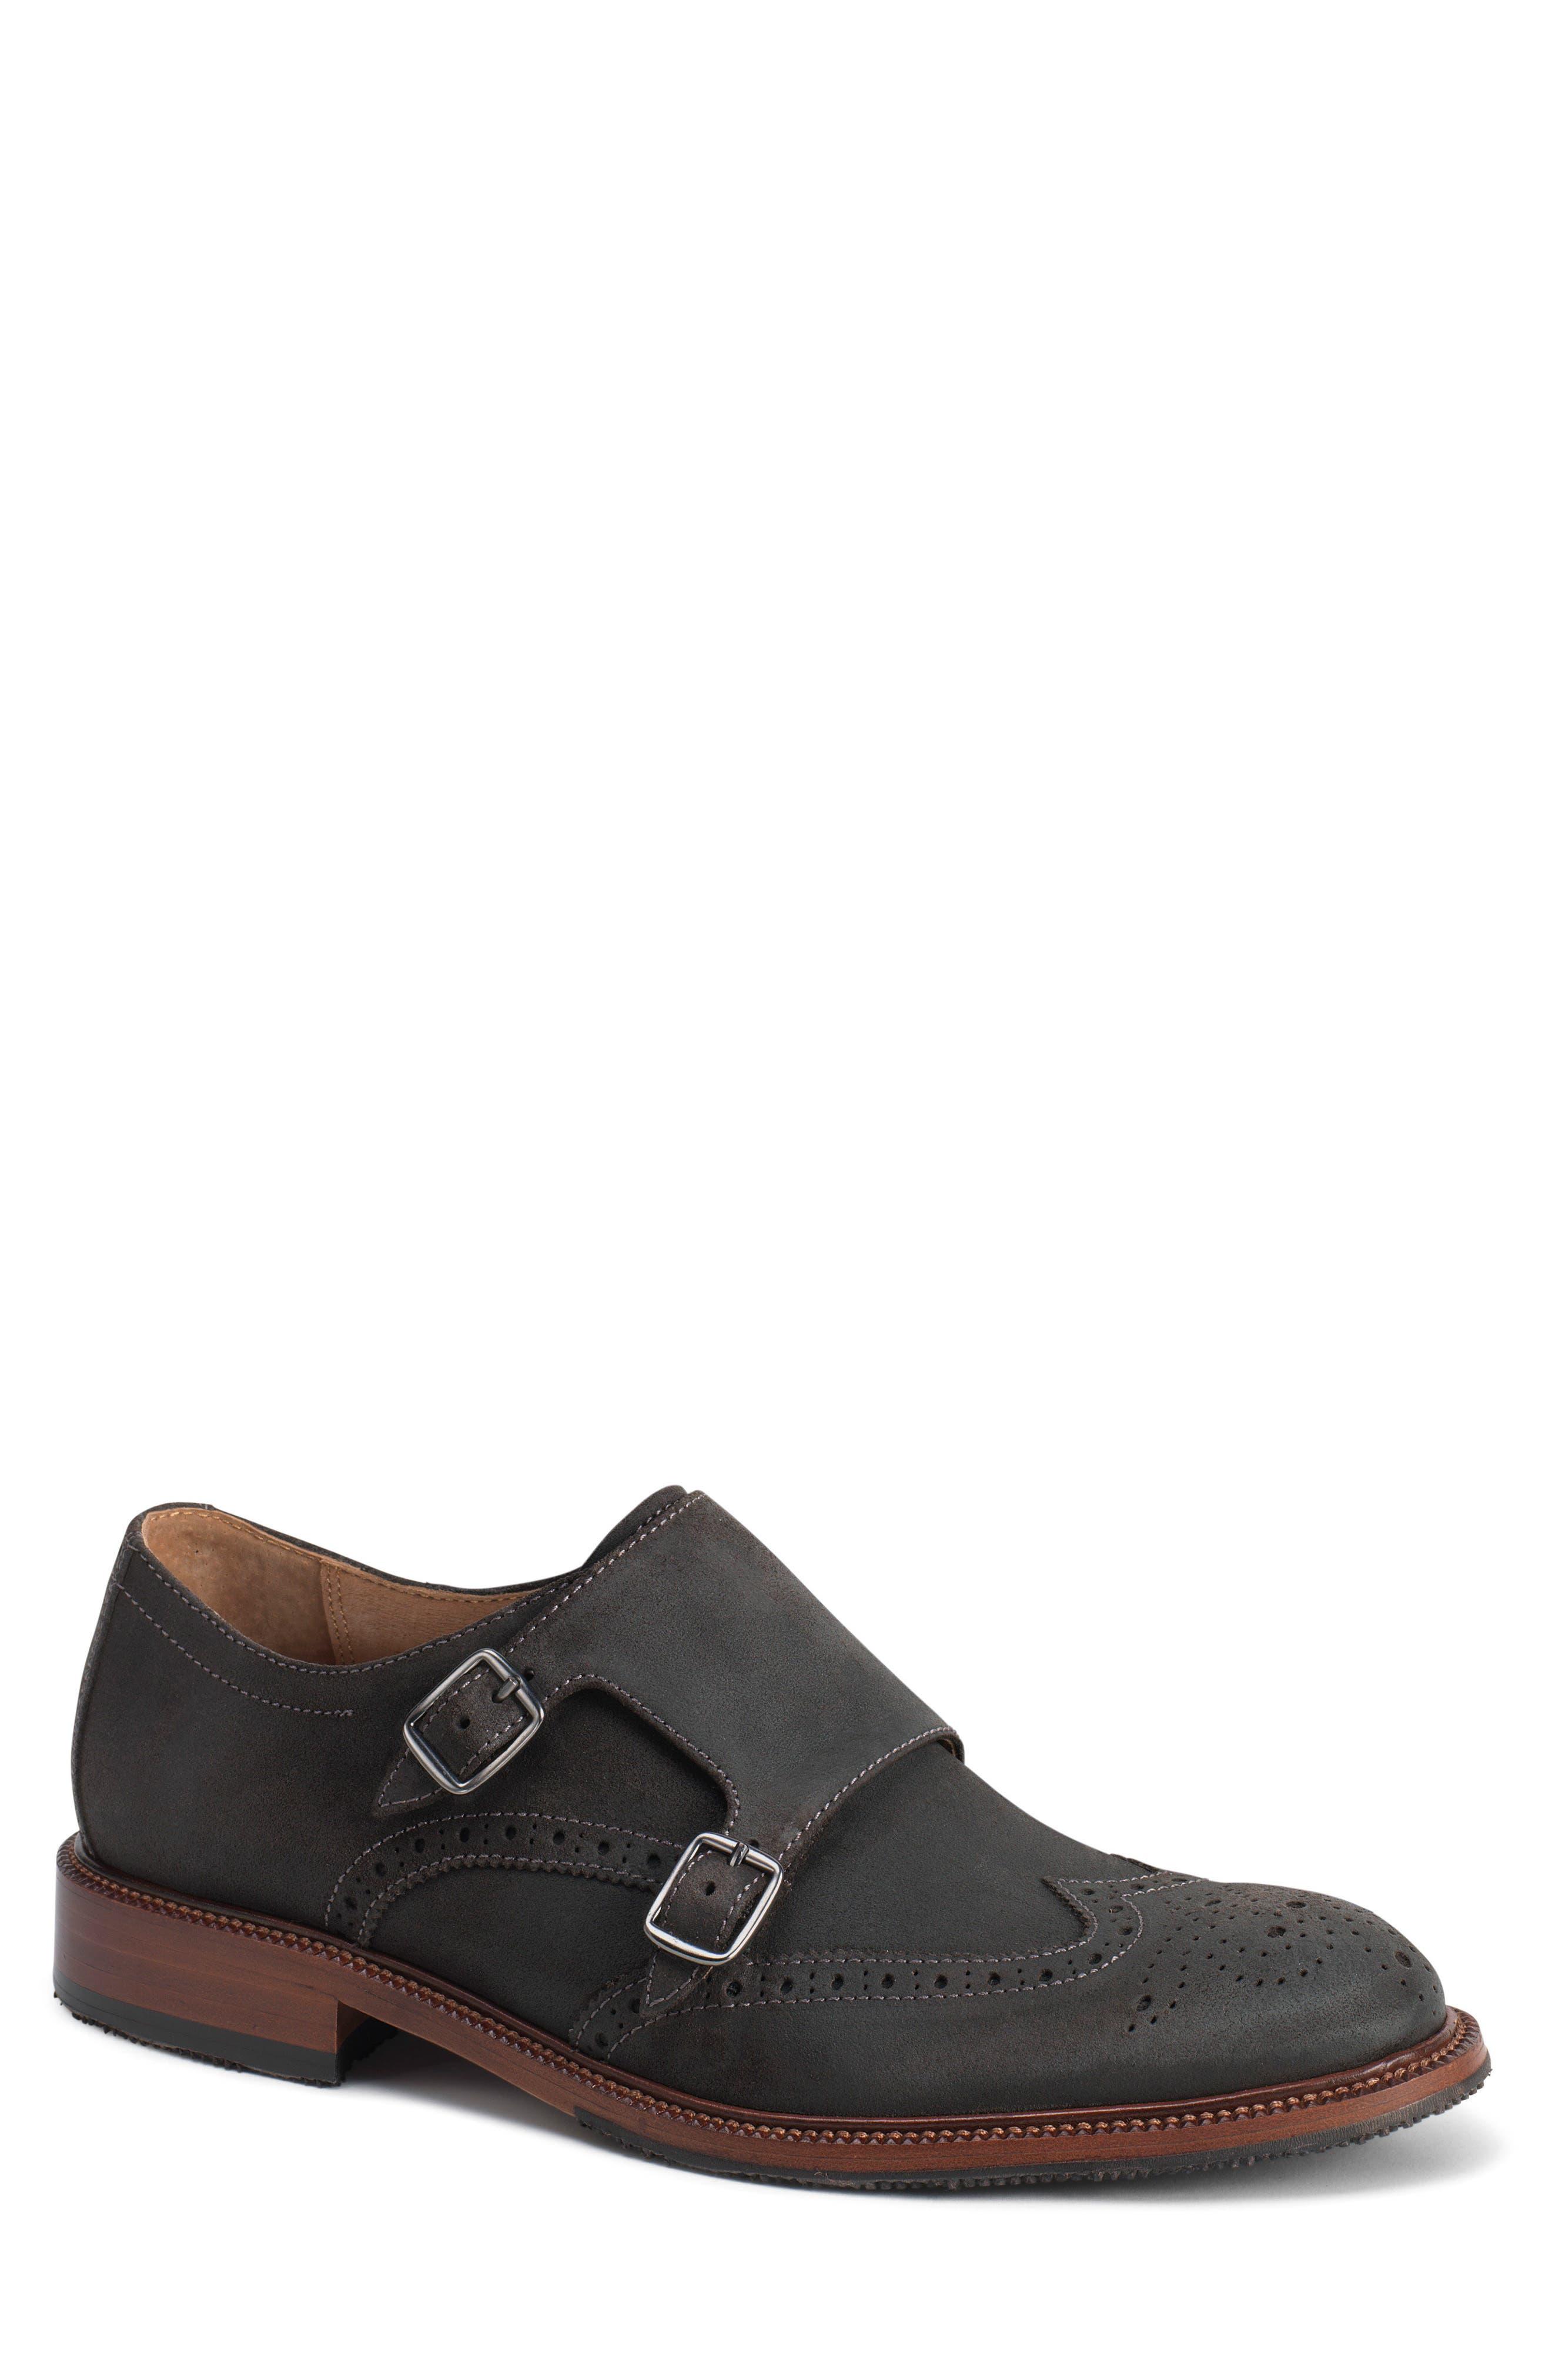 Leland Double Monk Strap Shoe,                         Main,                         color, GRAY WAXED SUEDE